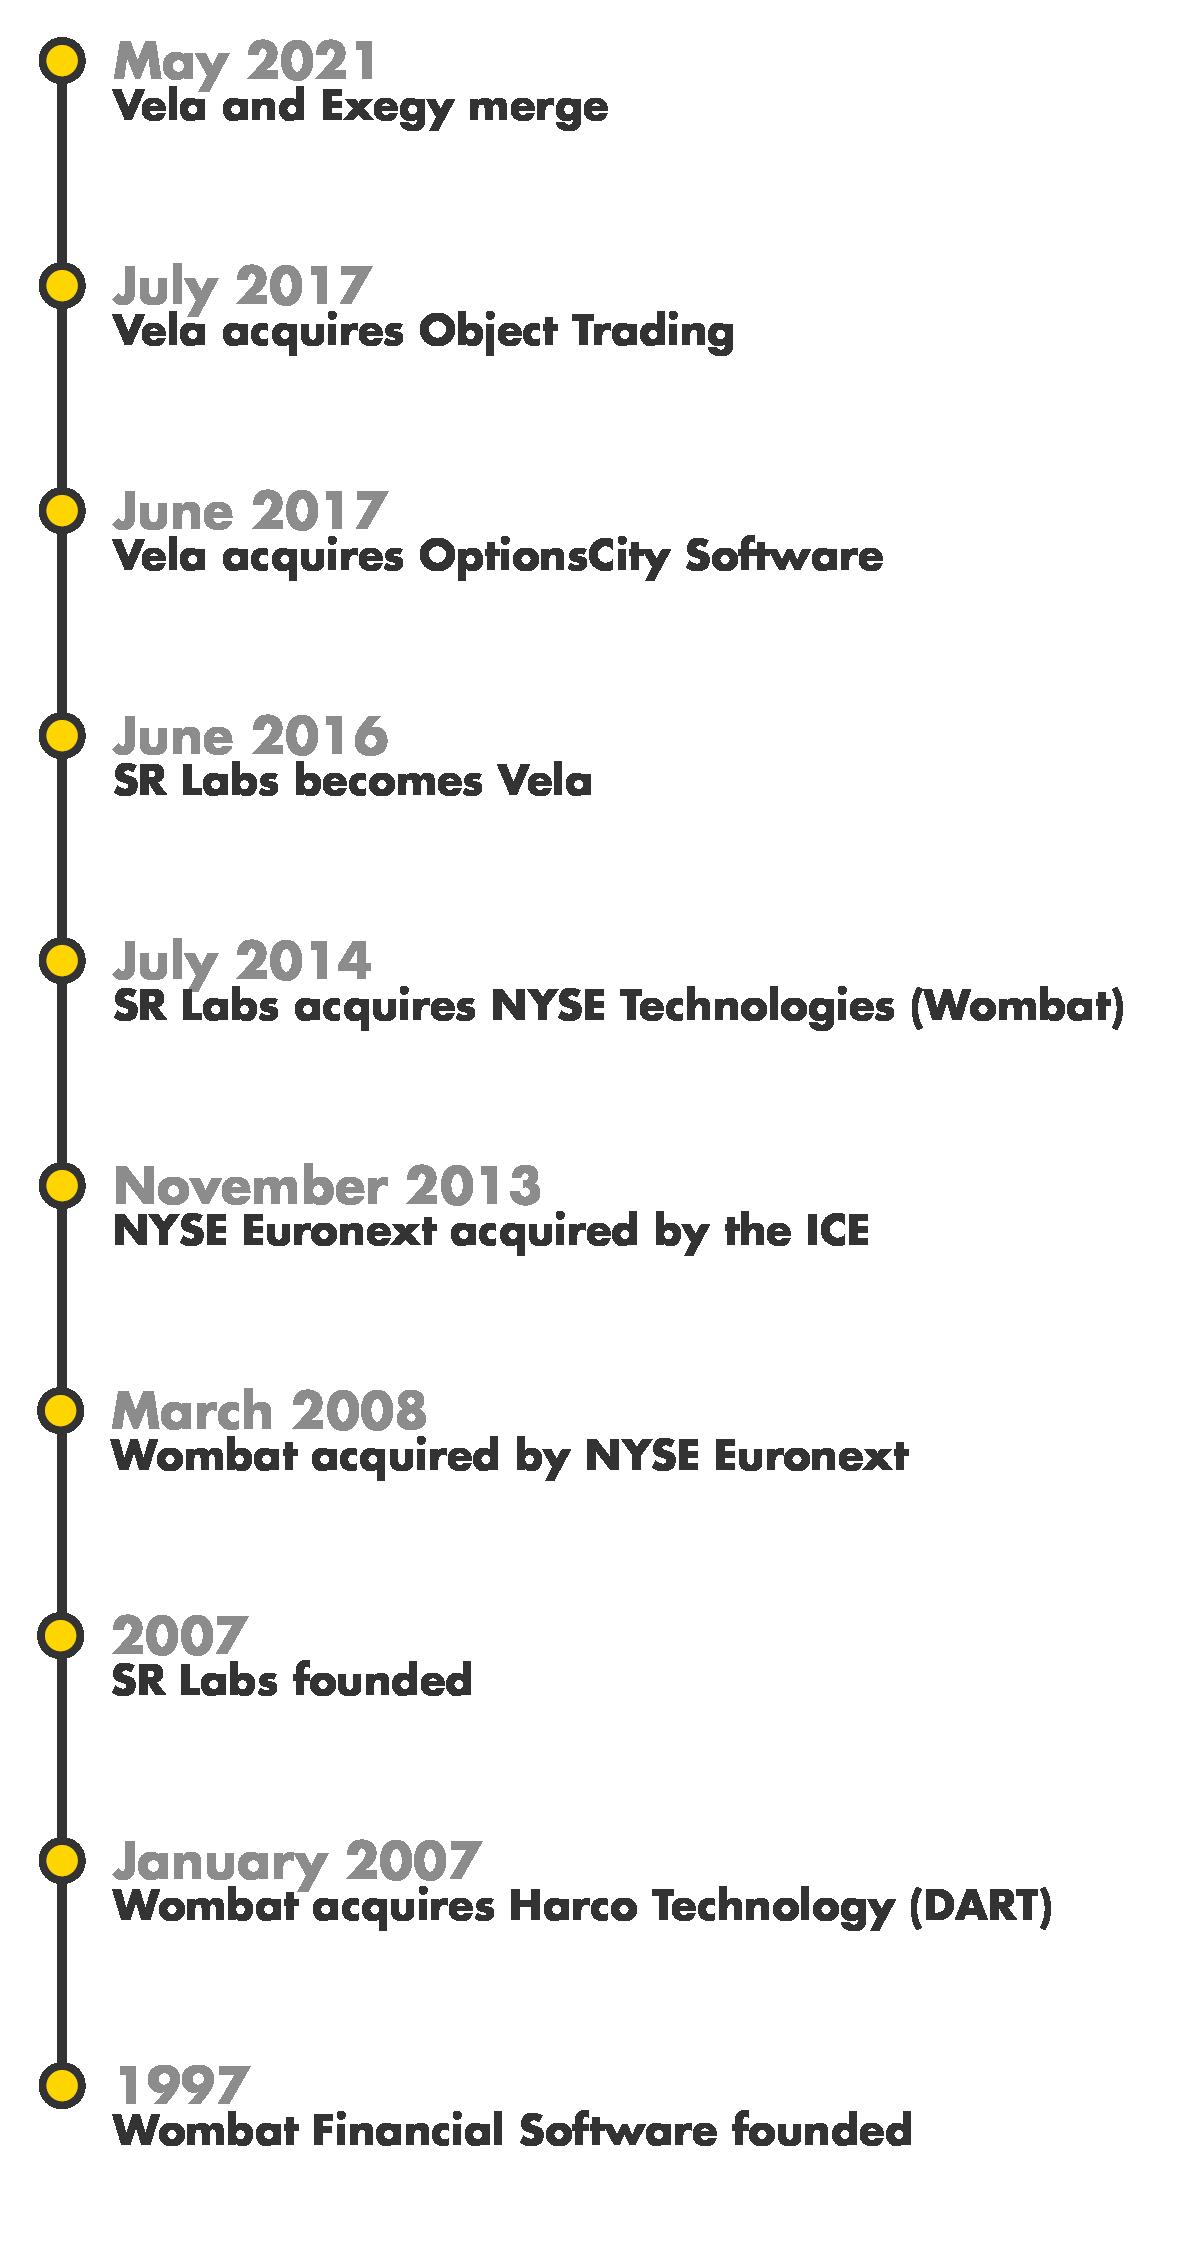 Vela's history at-a-glance